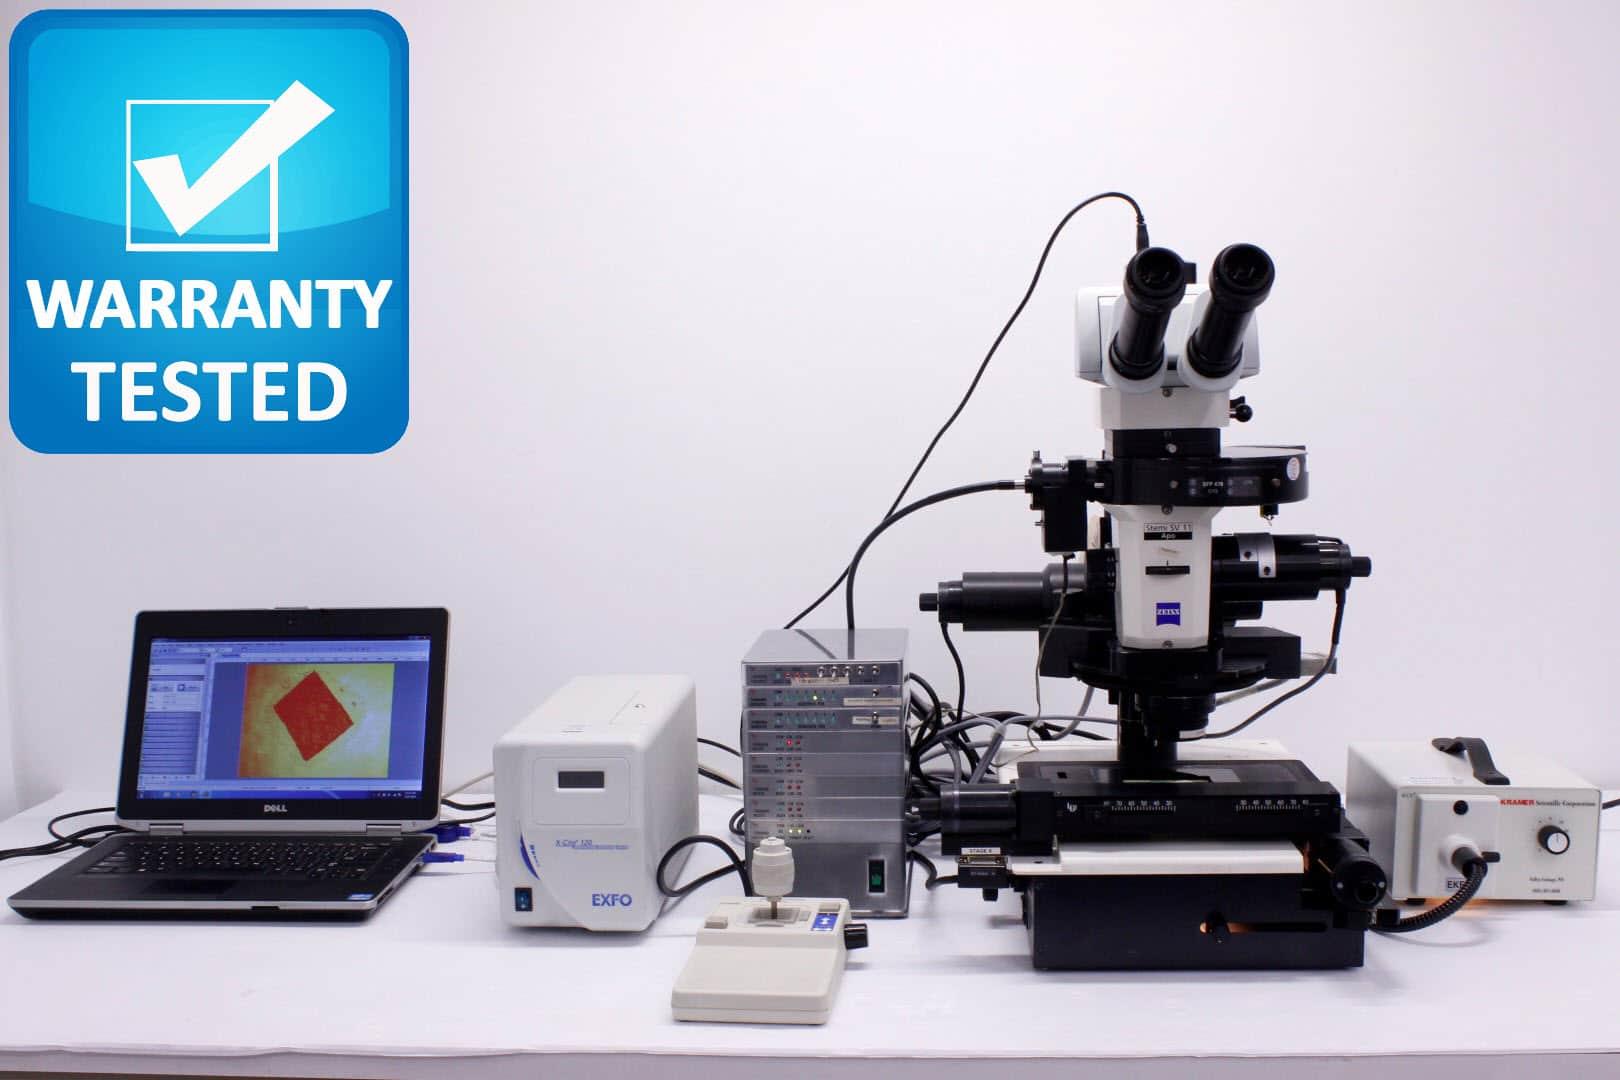 Zeiss Stemi SV 11 Apo Stereo Motorized Fluorescence Microscope Pred Discovery V12/V20